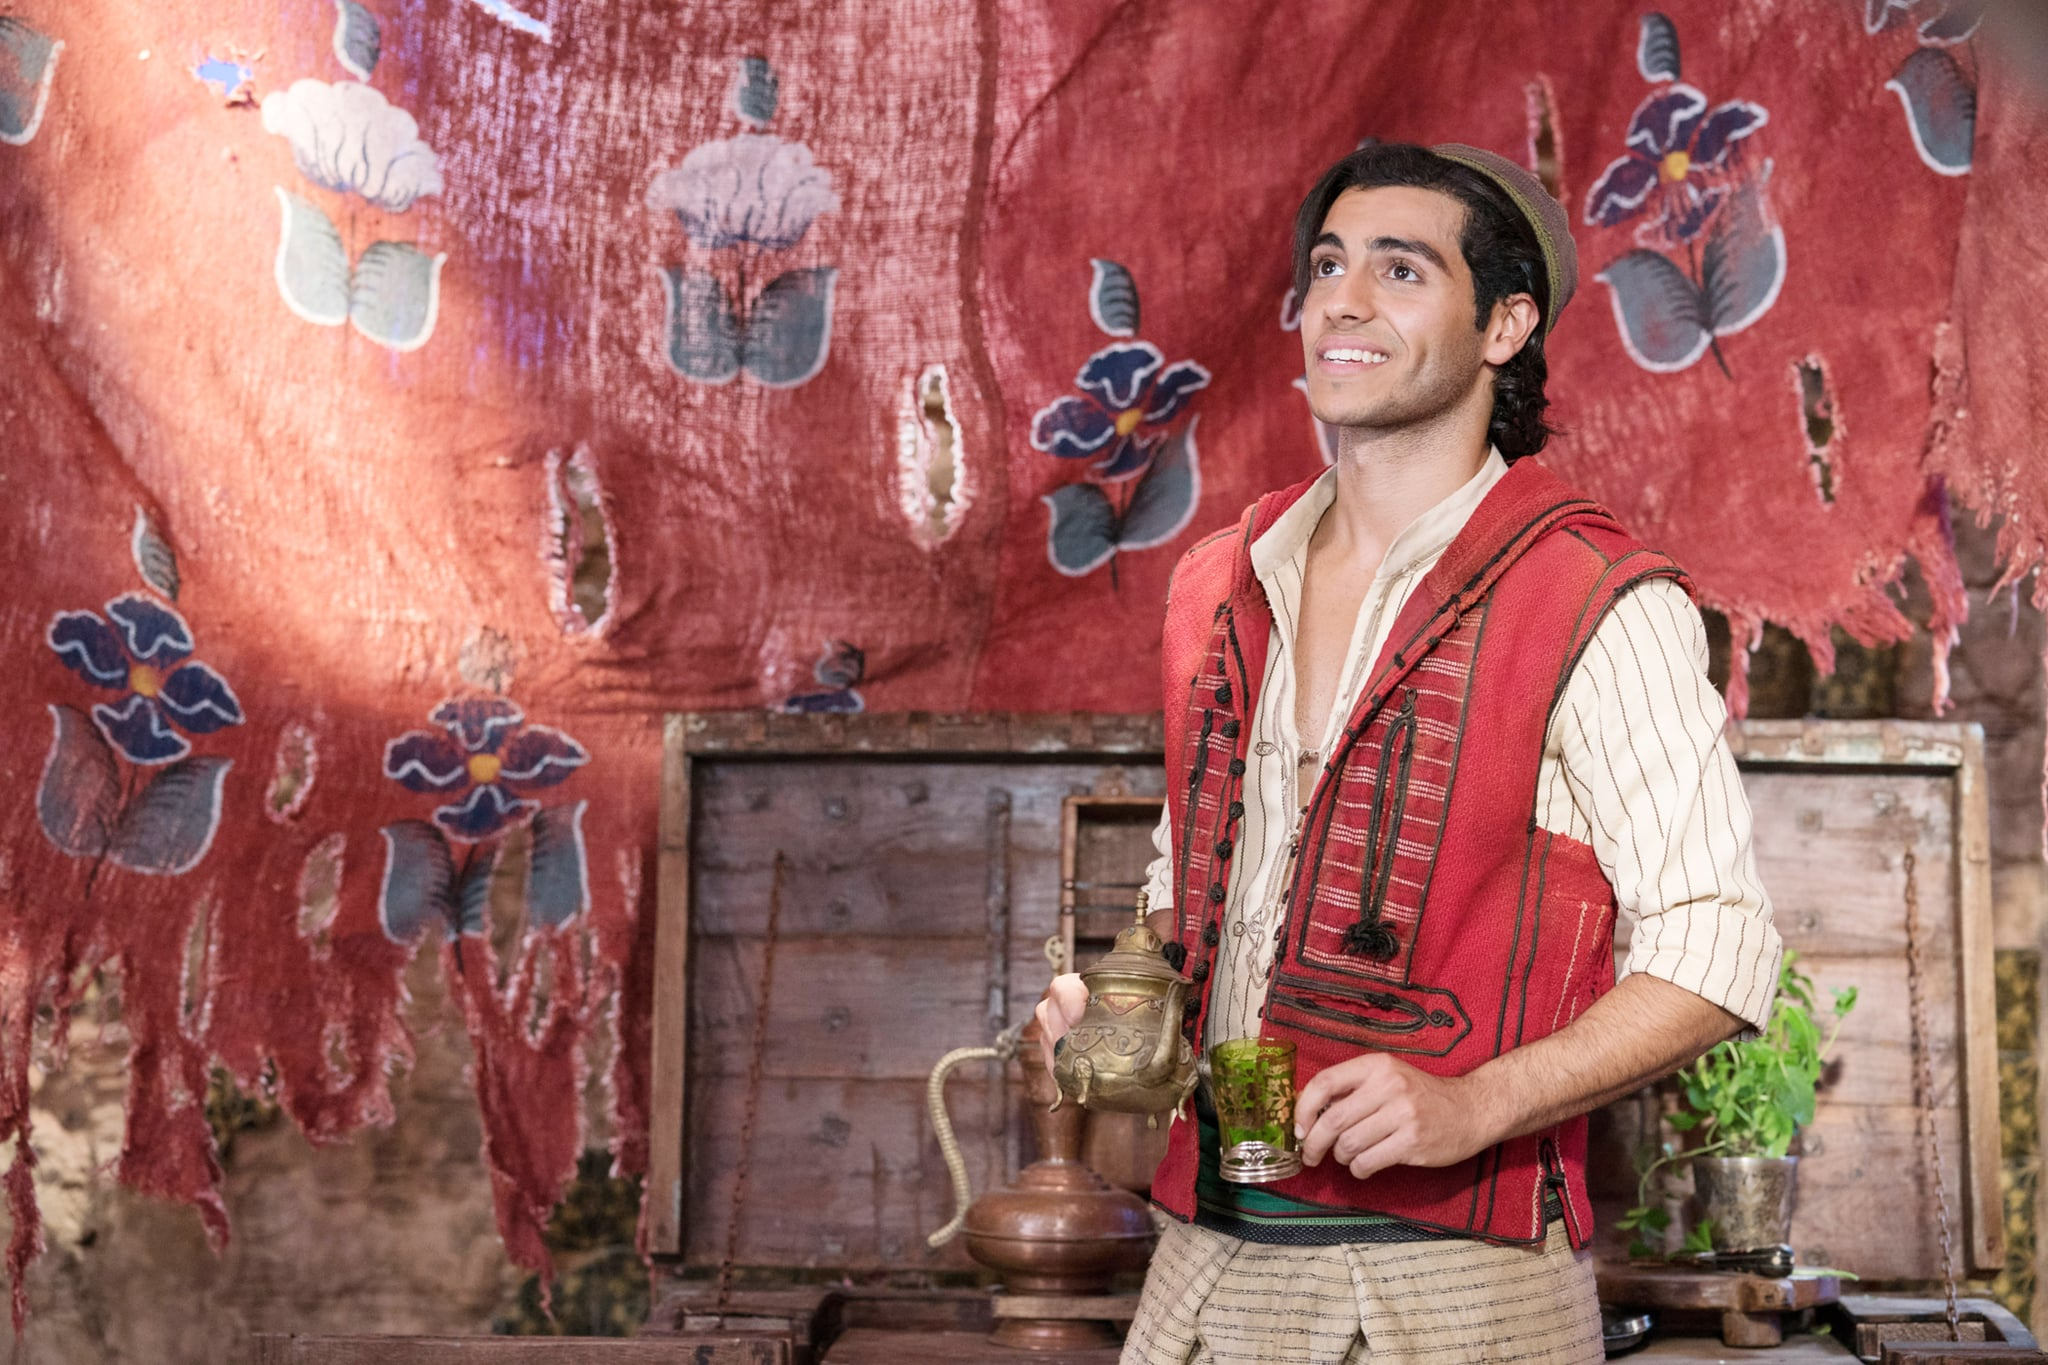 ALADDIN, Mena Massoud as Aladdin, 2019. ph: Daniel Smith /  Walt Disney Studios Motion Pictures / courtesy Everett Collection